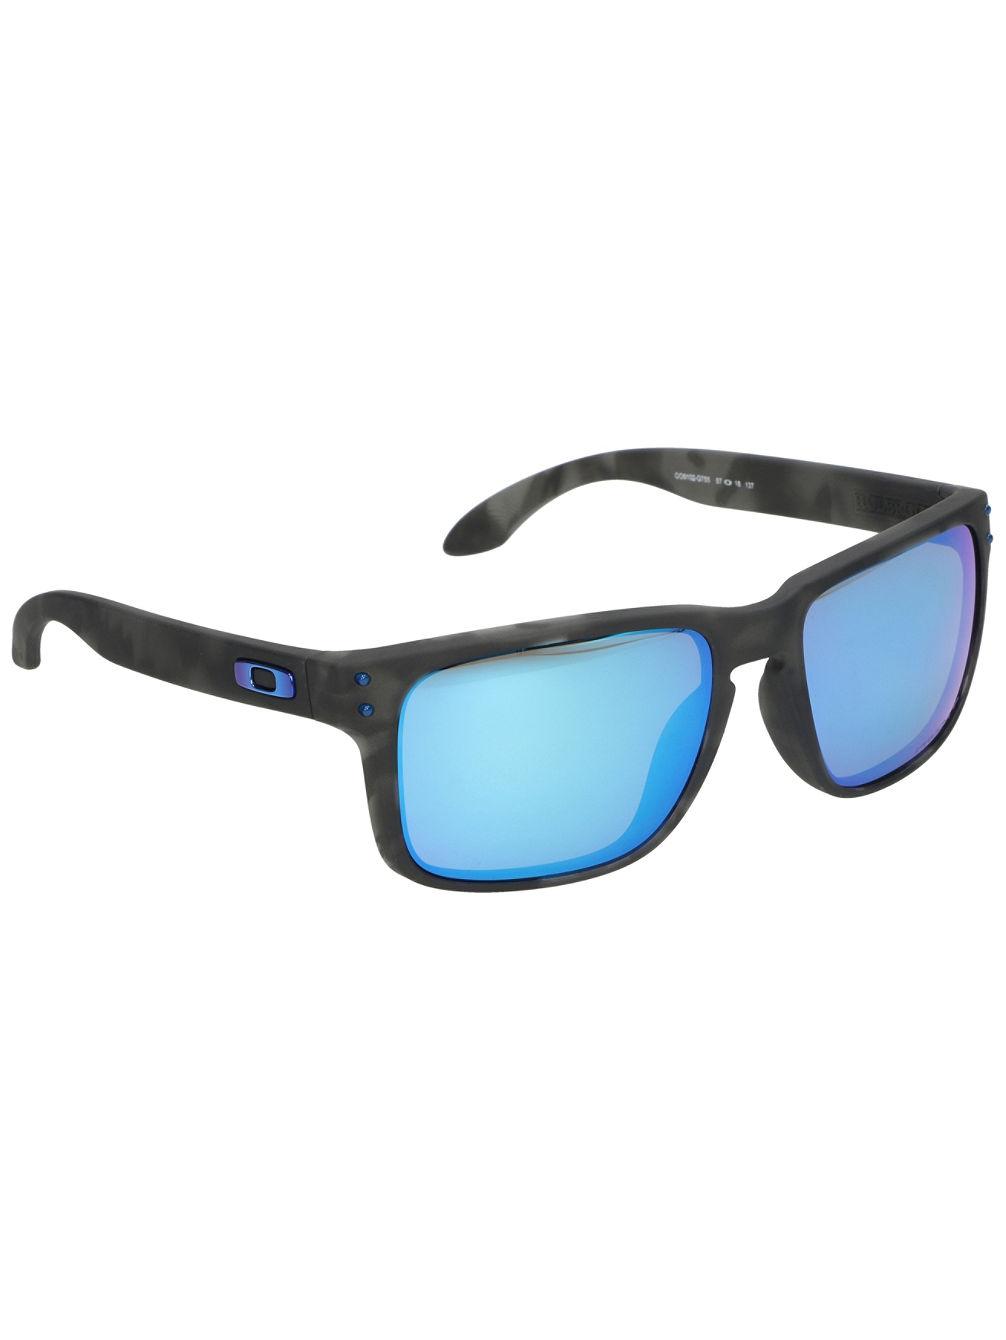 34bf03366 Compra Oakley Holbrook Matte Black Tortoise Gafas de Sol en línea en ...